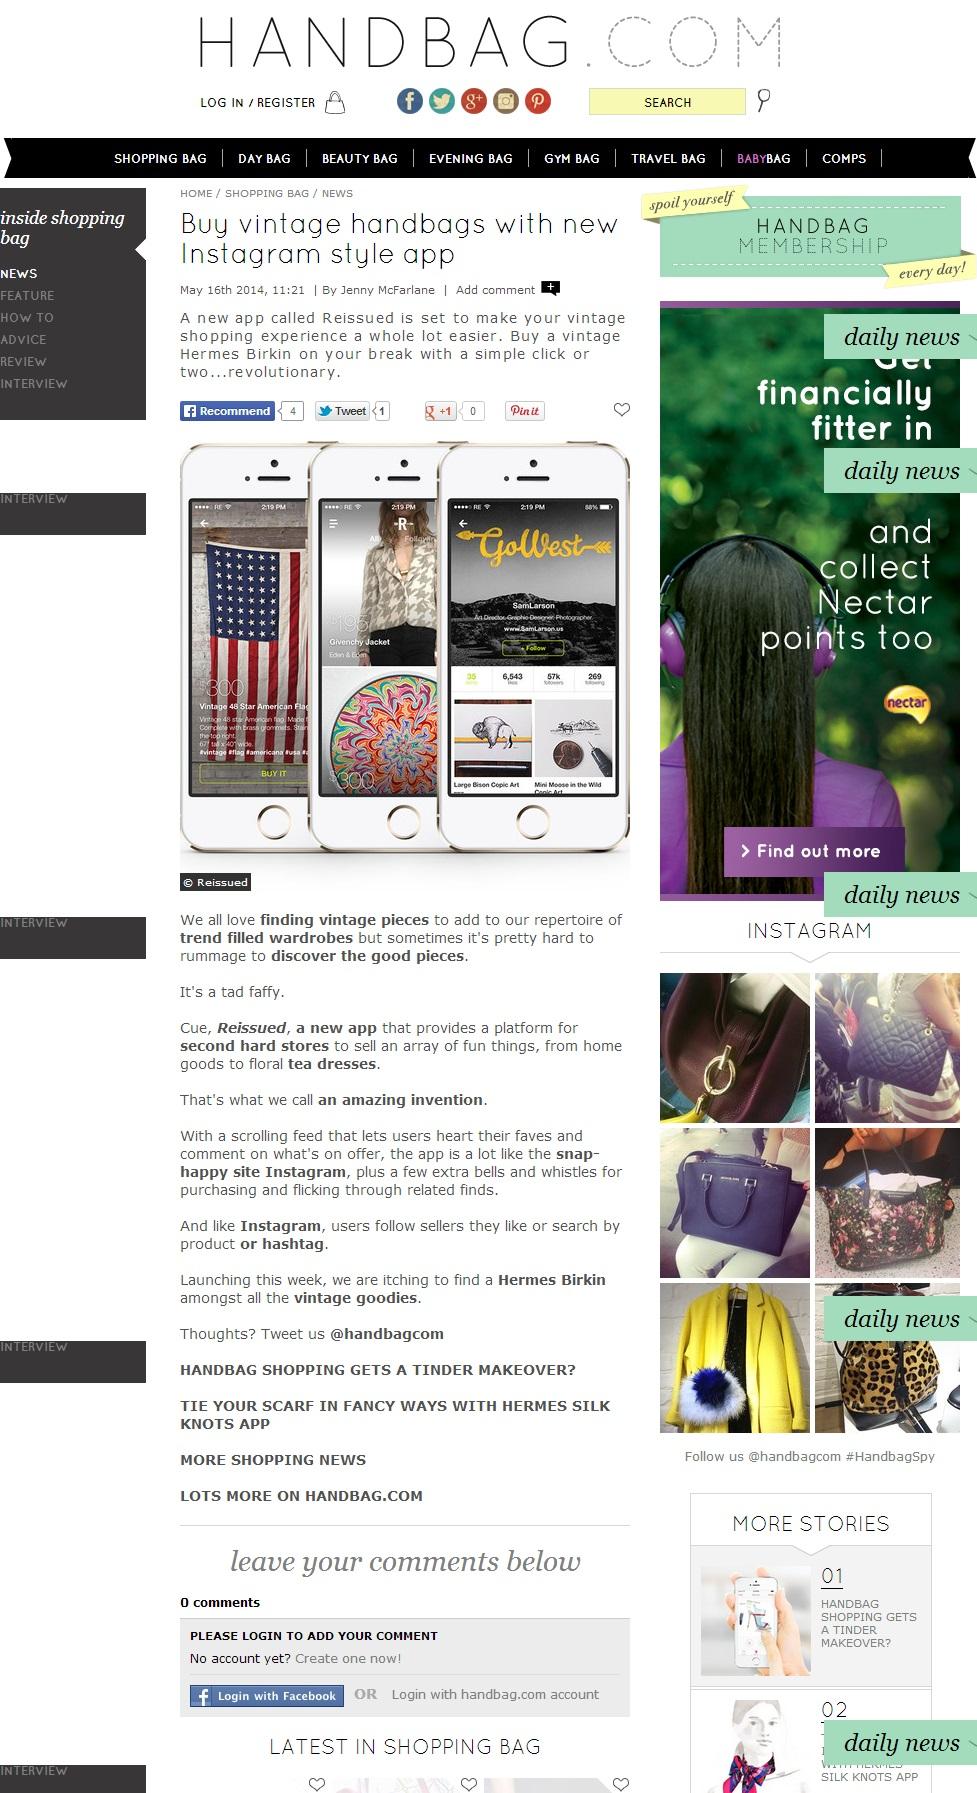 screencapture-www-handbag-com-shopping-bag-news-a571443-buy-vintage-handbags-with-new-instagram-style-app-html